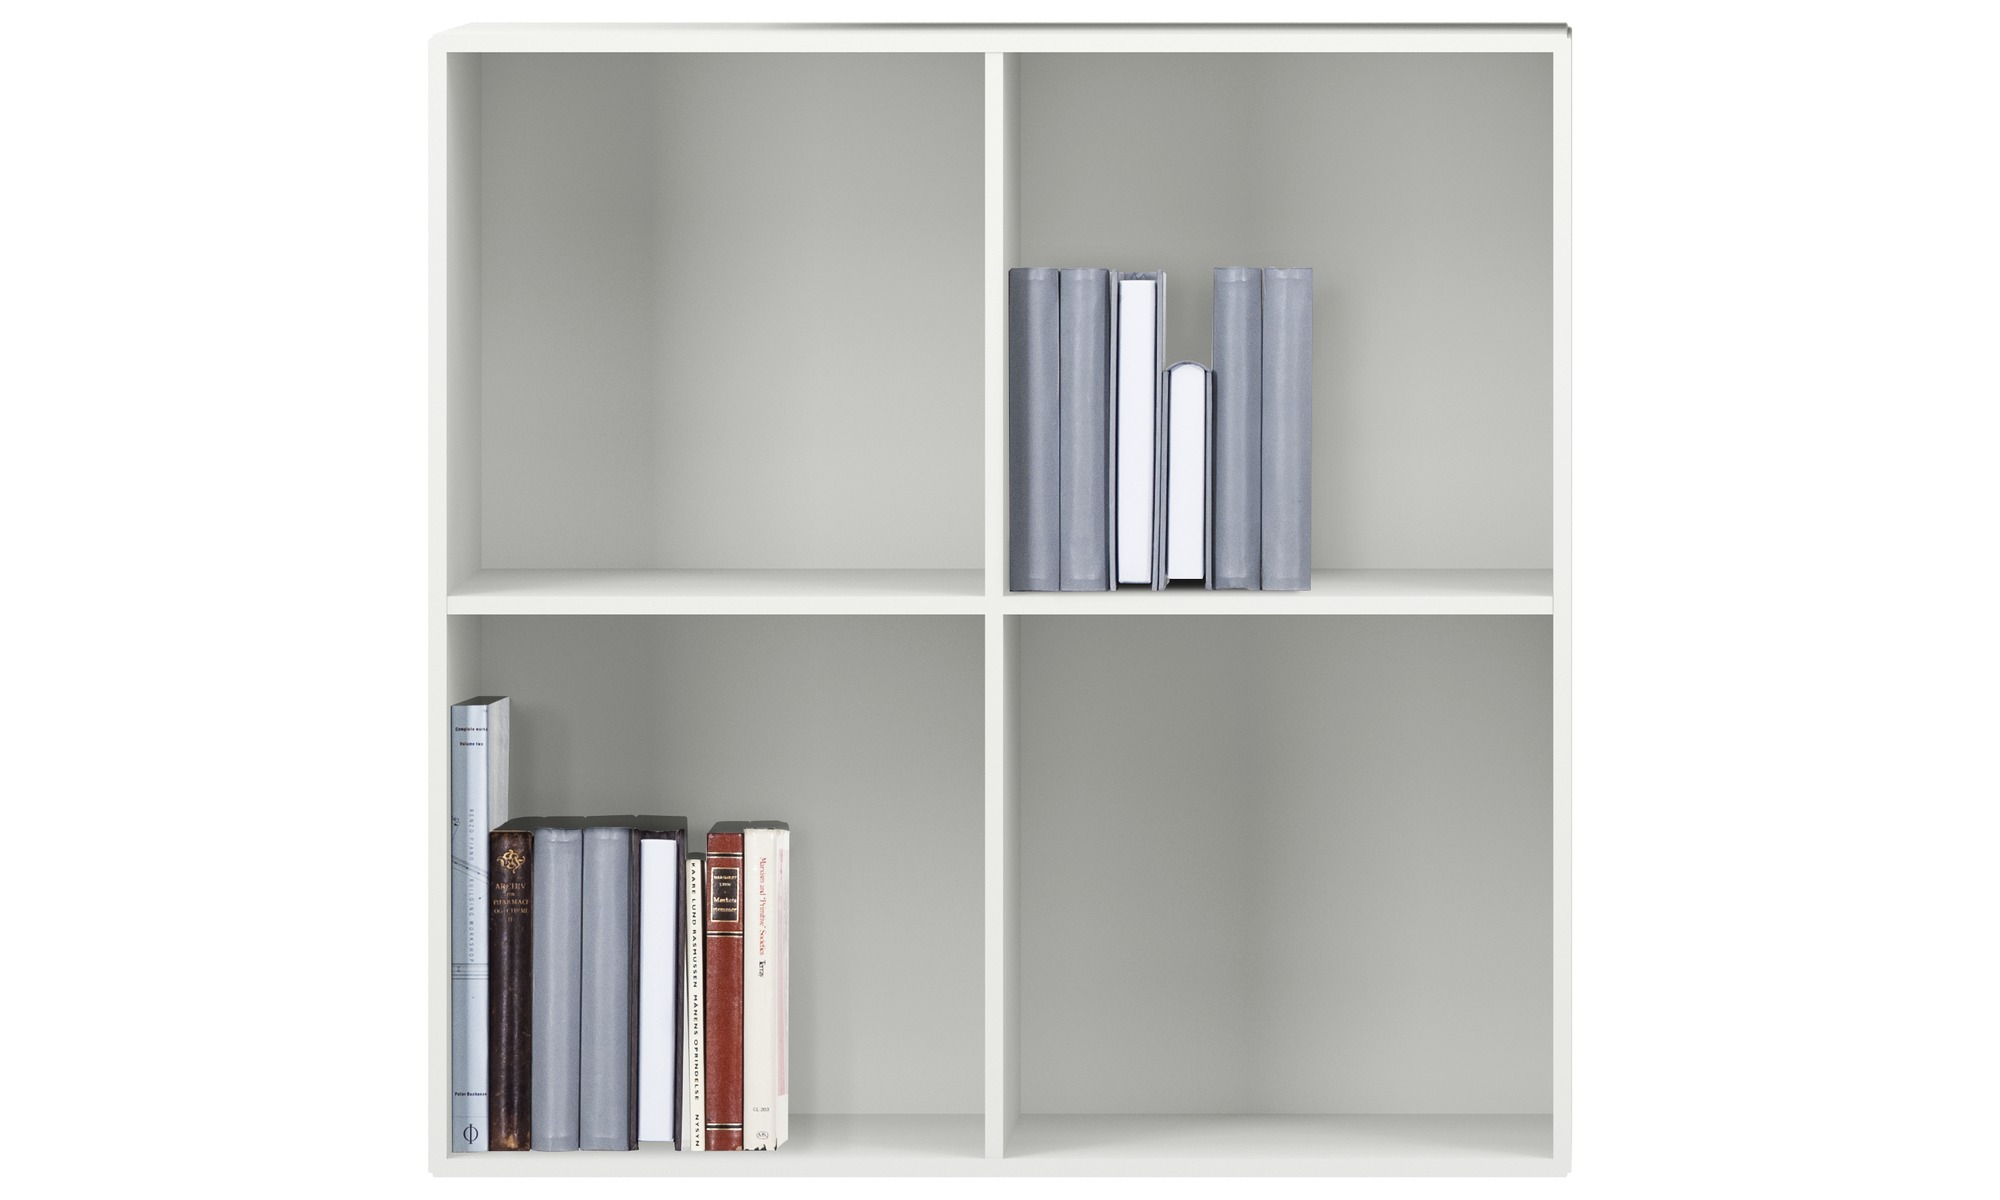 Wandsysteme - Como Regal - Weiß - Lack